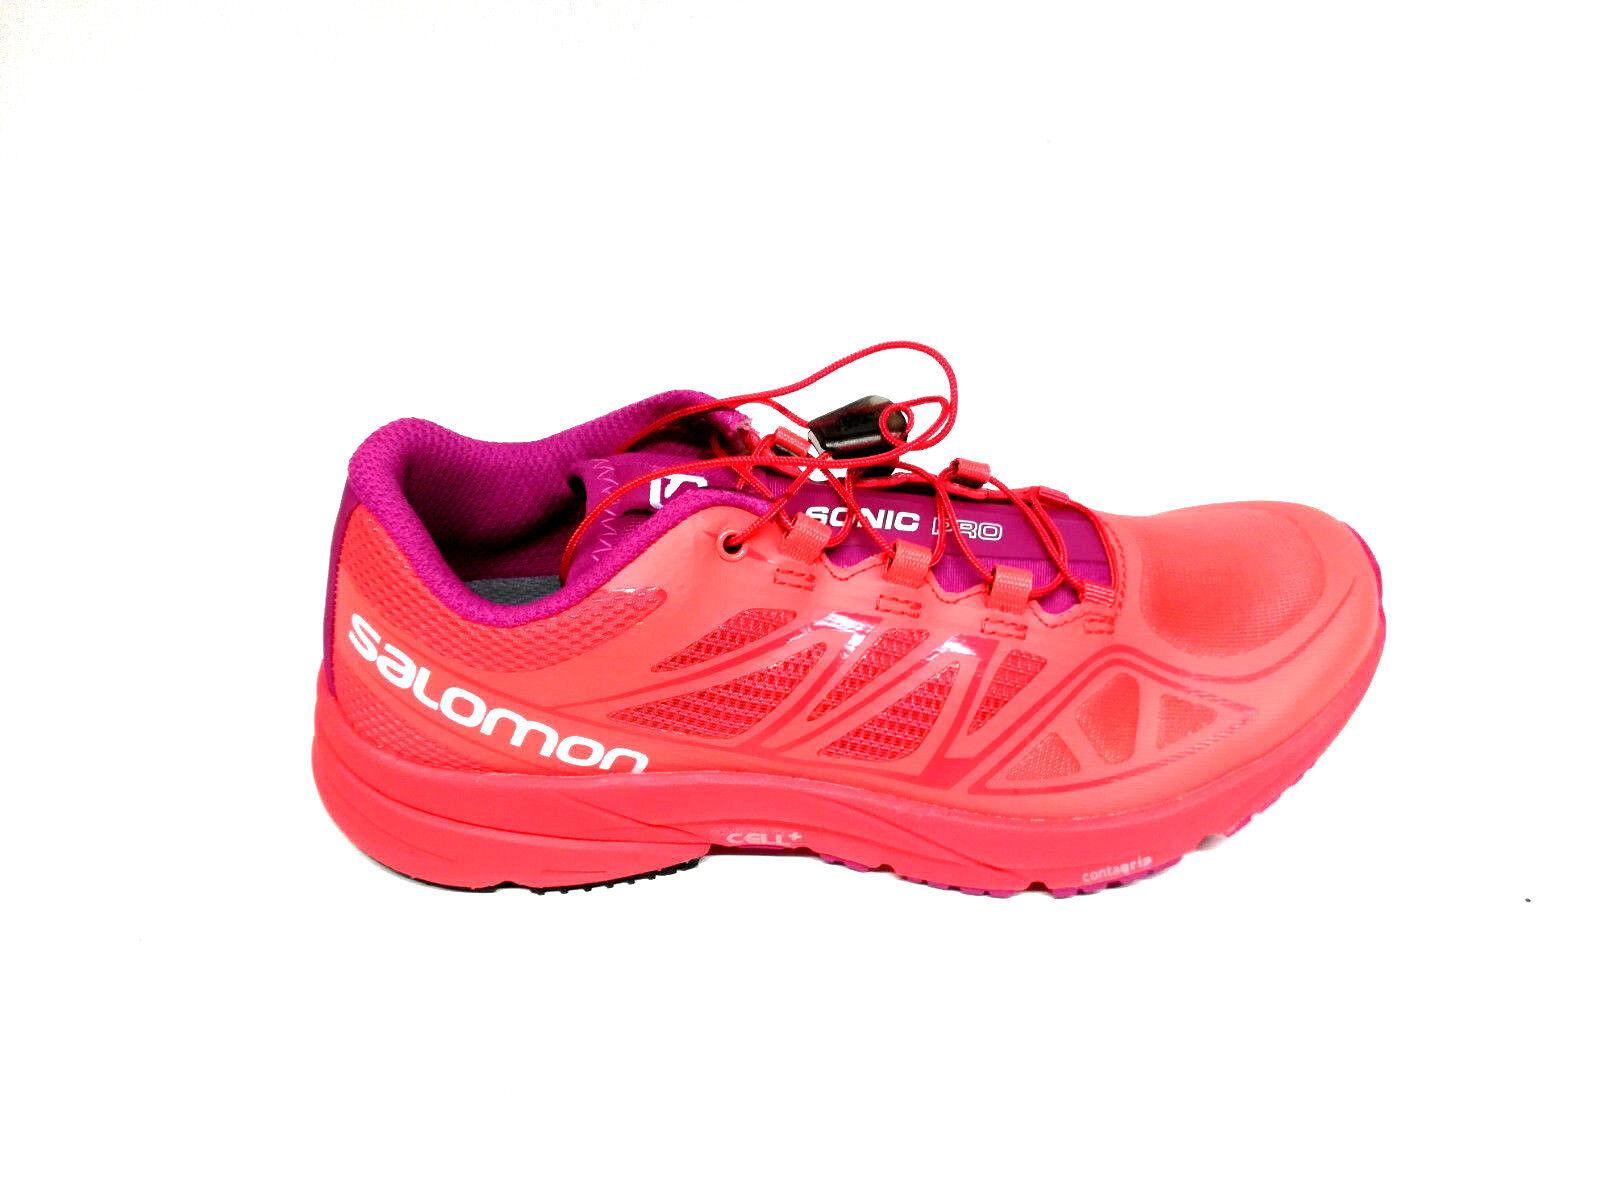 Salomon Sonic pro rosado W coral punch, naranja rosado pro 37 1 3 Zapatos señora 03e953